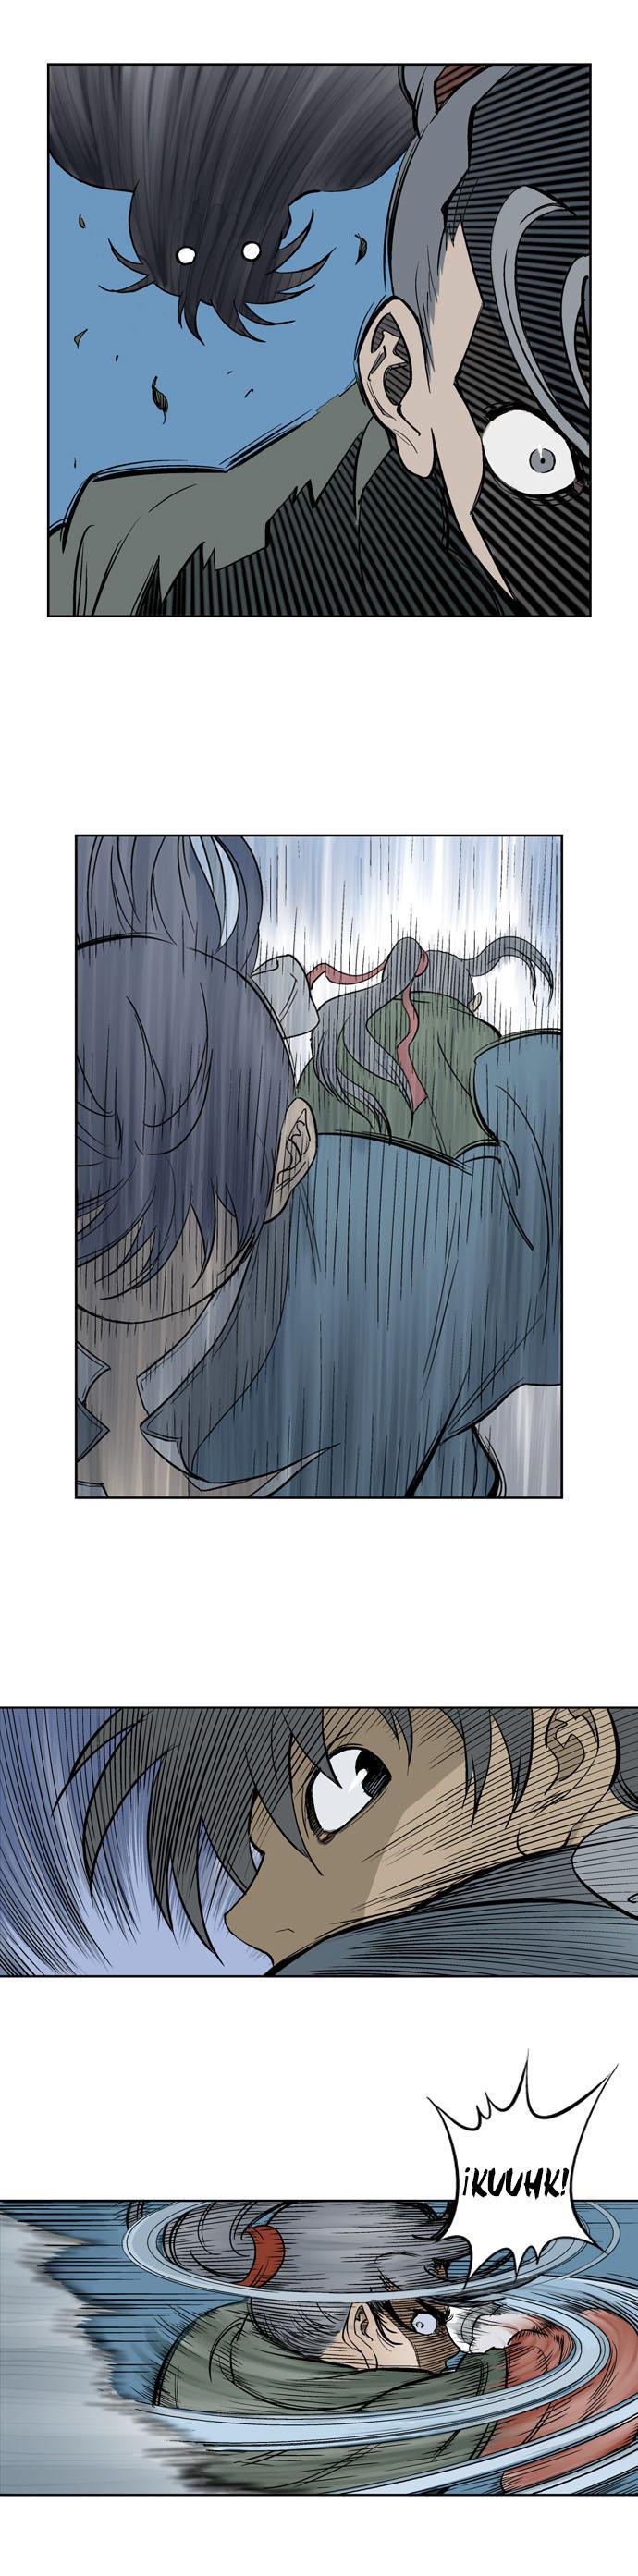 https://c5.ninemanga.com/es_manga/9/18249/452519/0282ea129cd8099b654da64c88c6347f.jpg Page 9